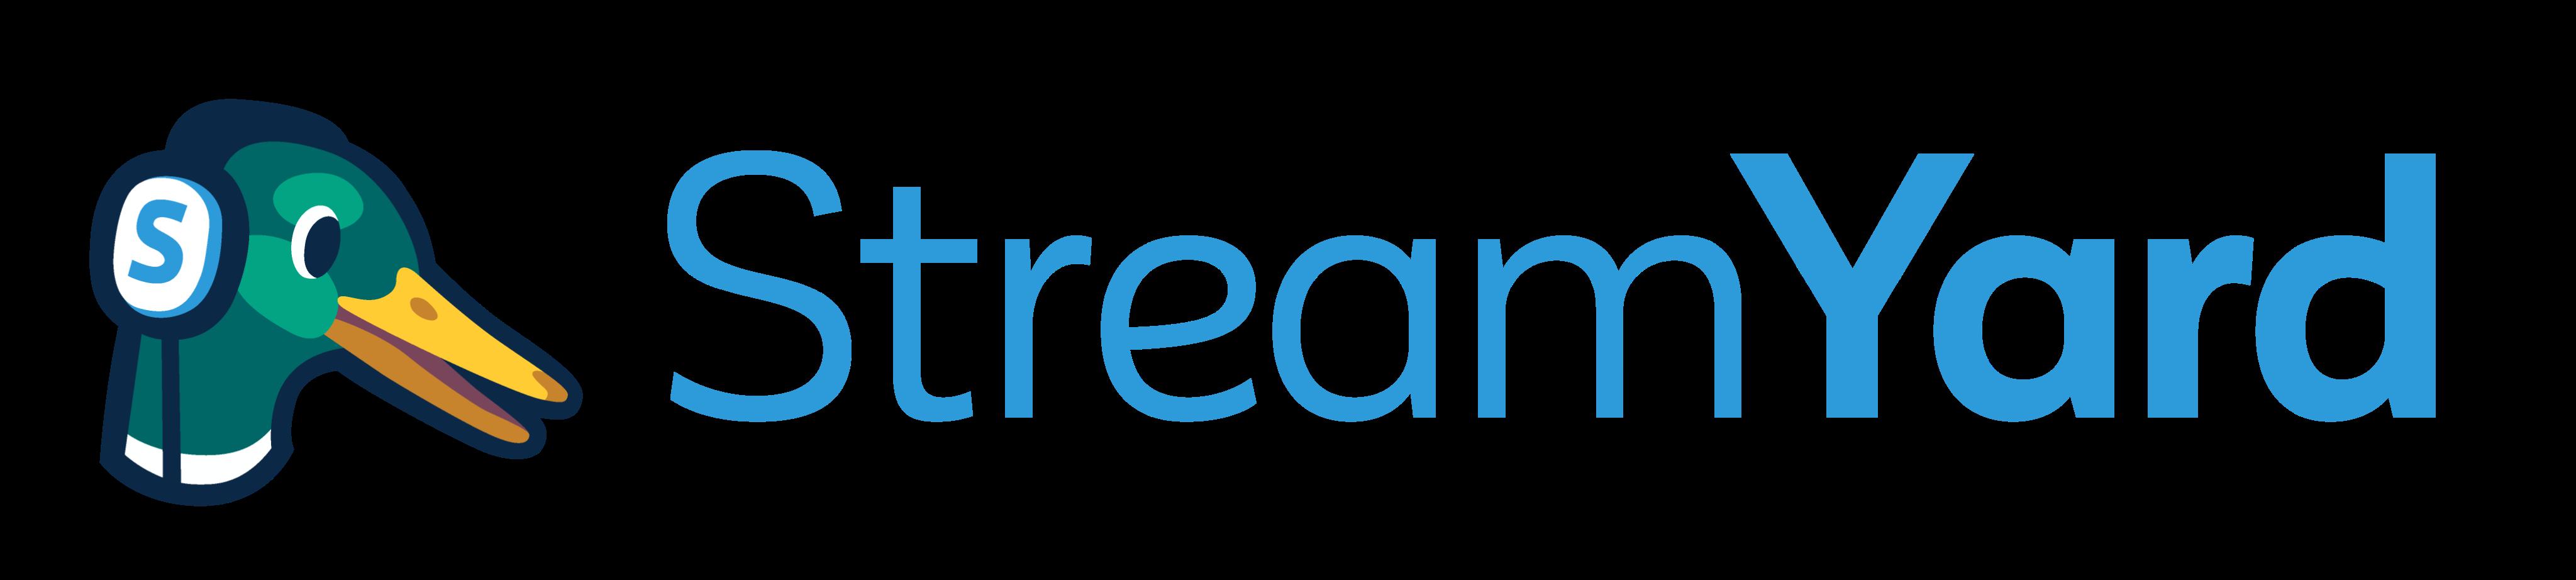 streamyard - streaming verktyg